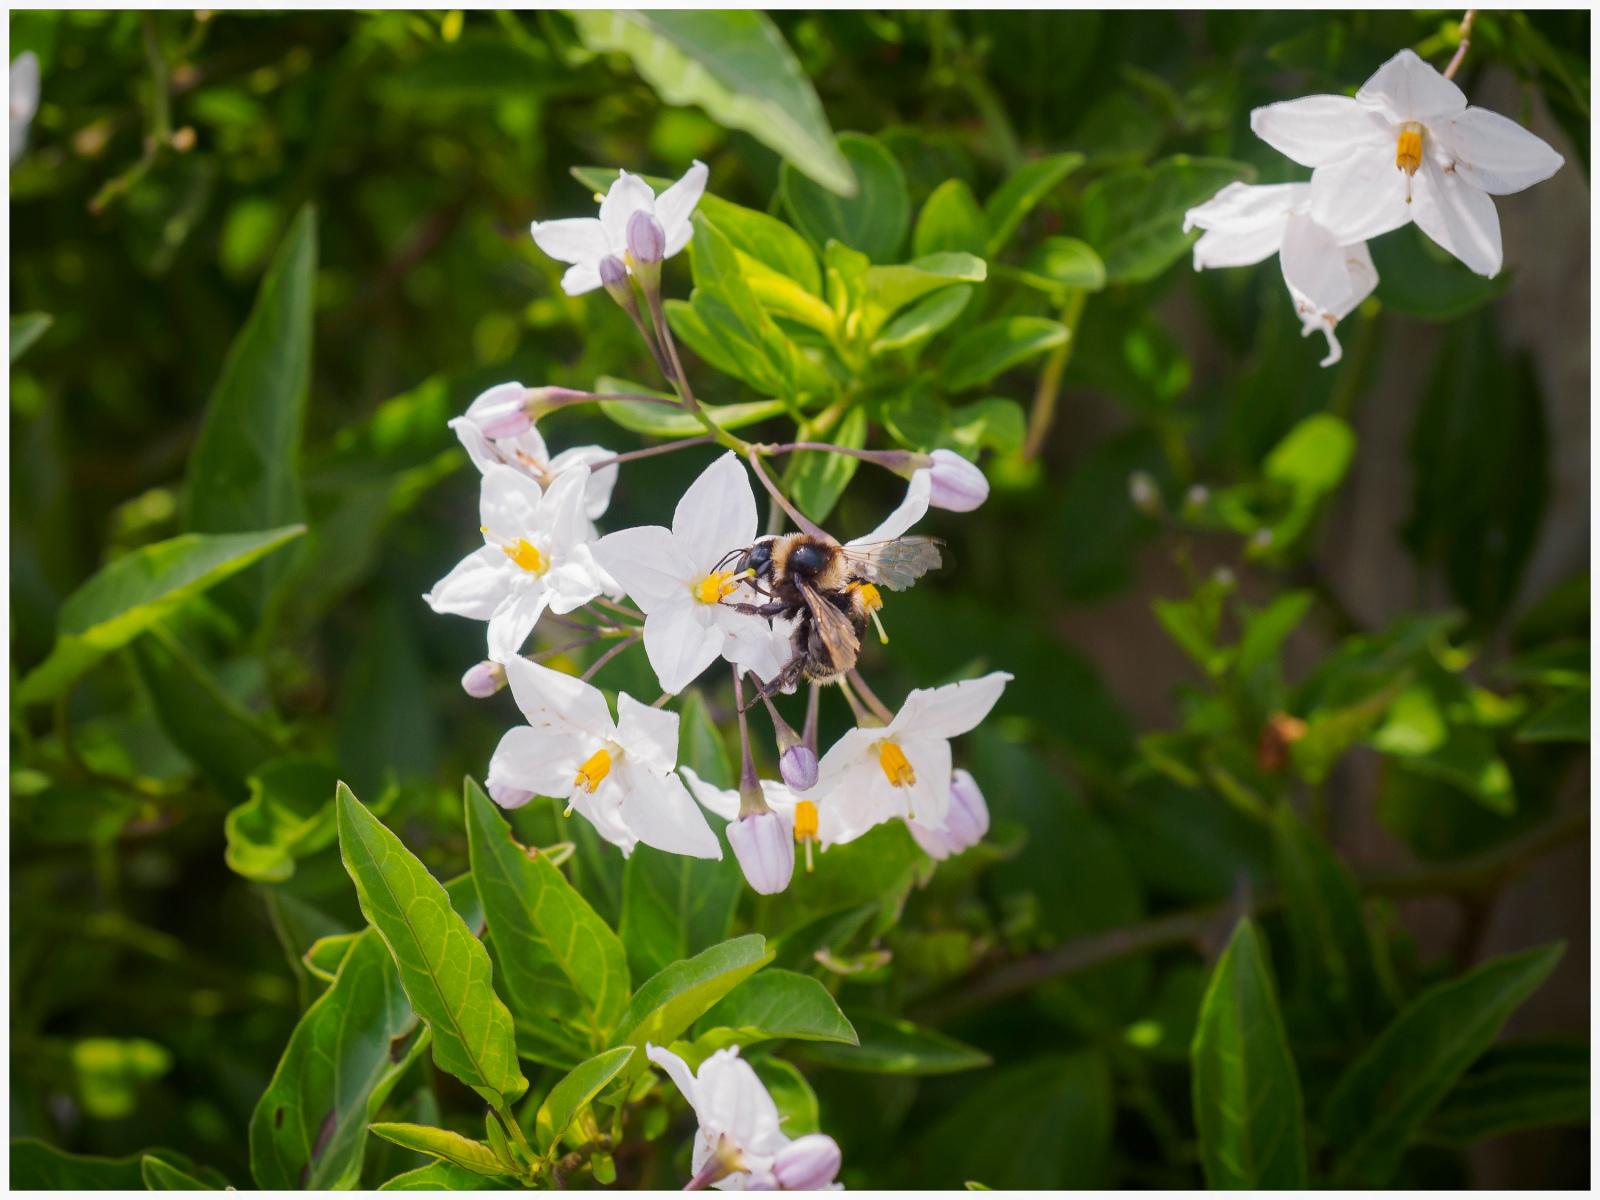 Bumblebee in Hobbiton